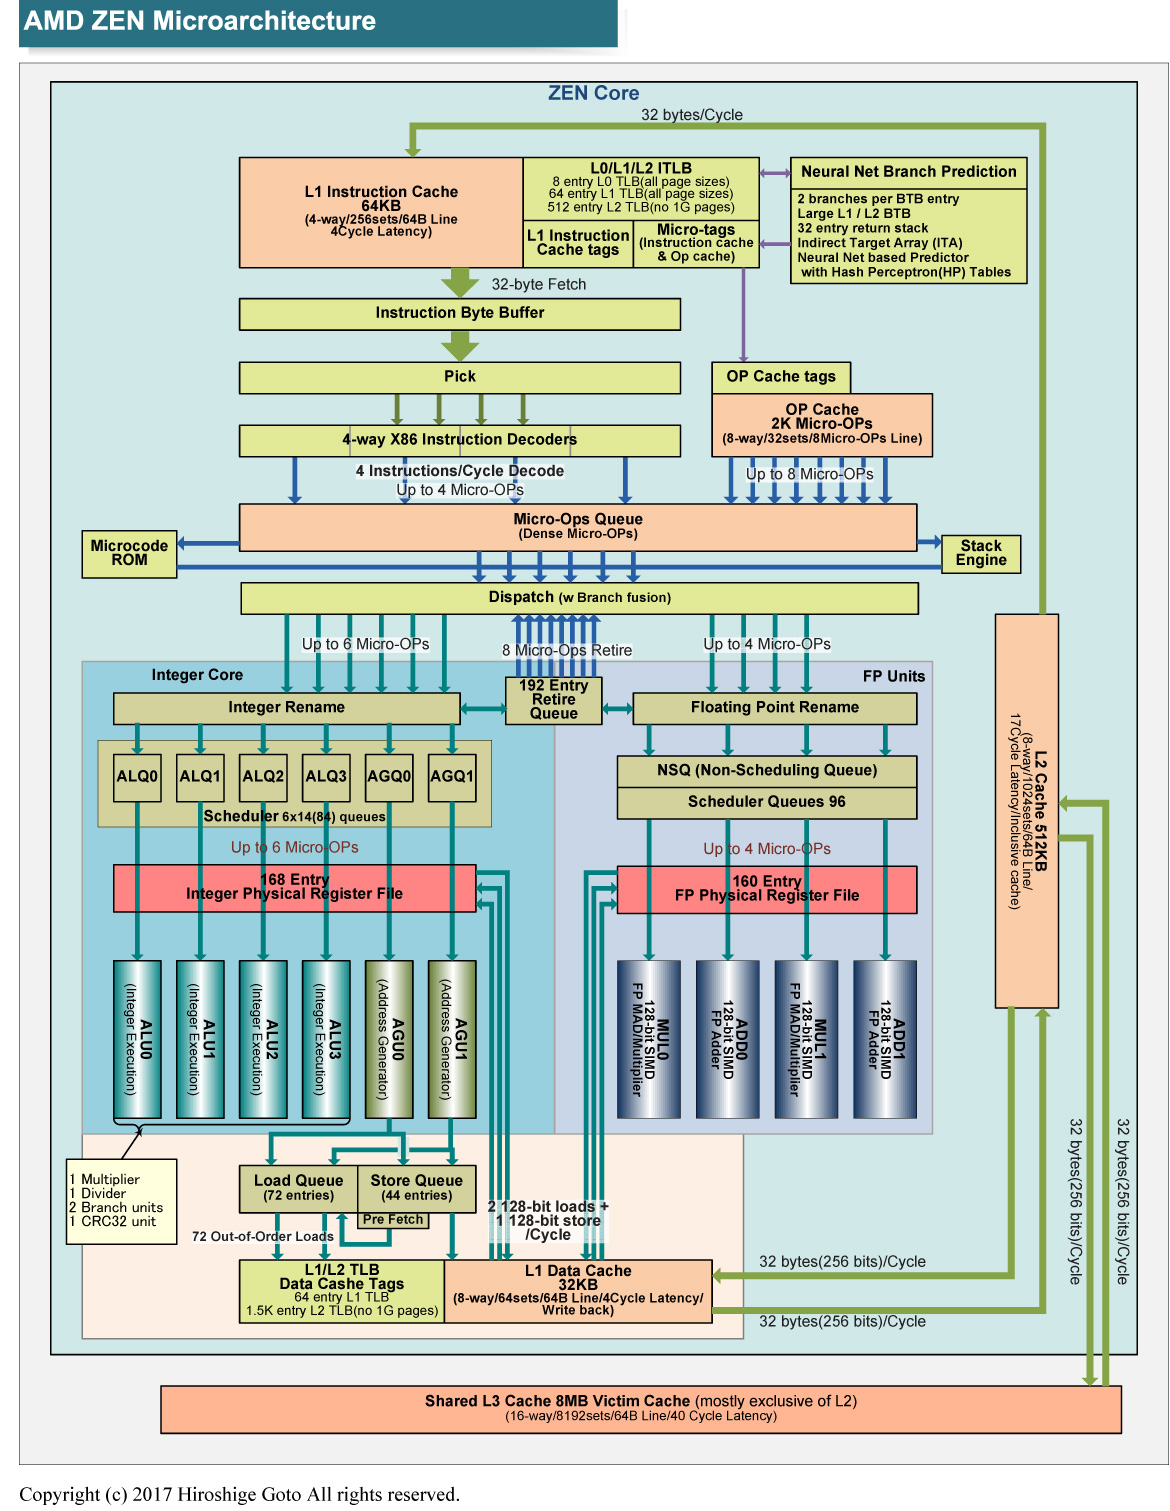 ZENのマイクロアーキテクチャ